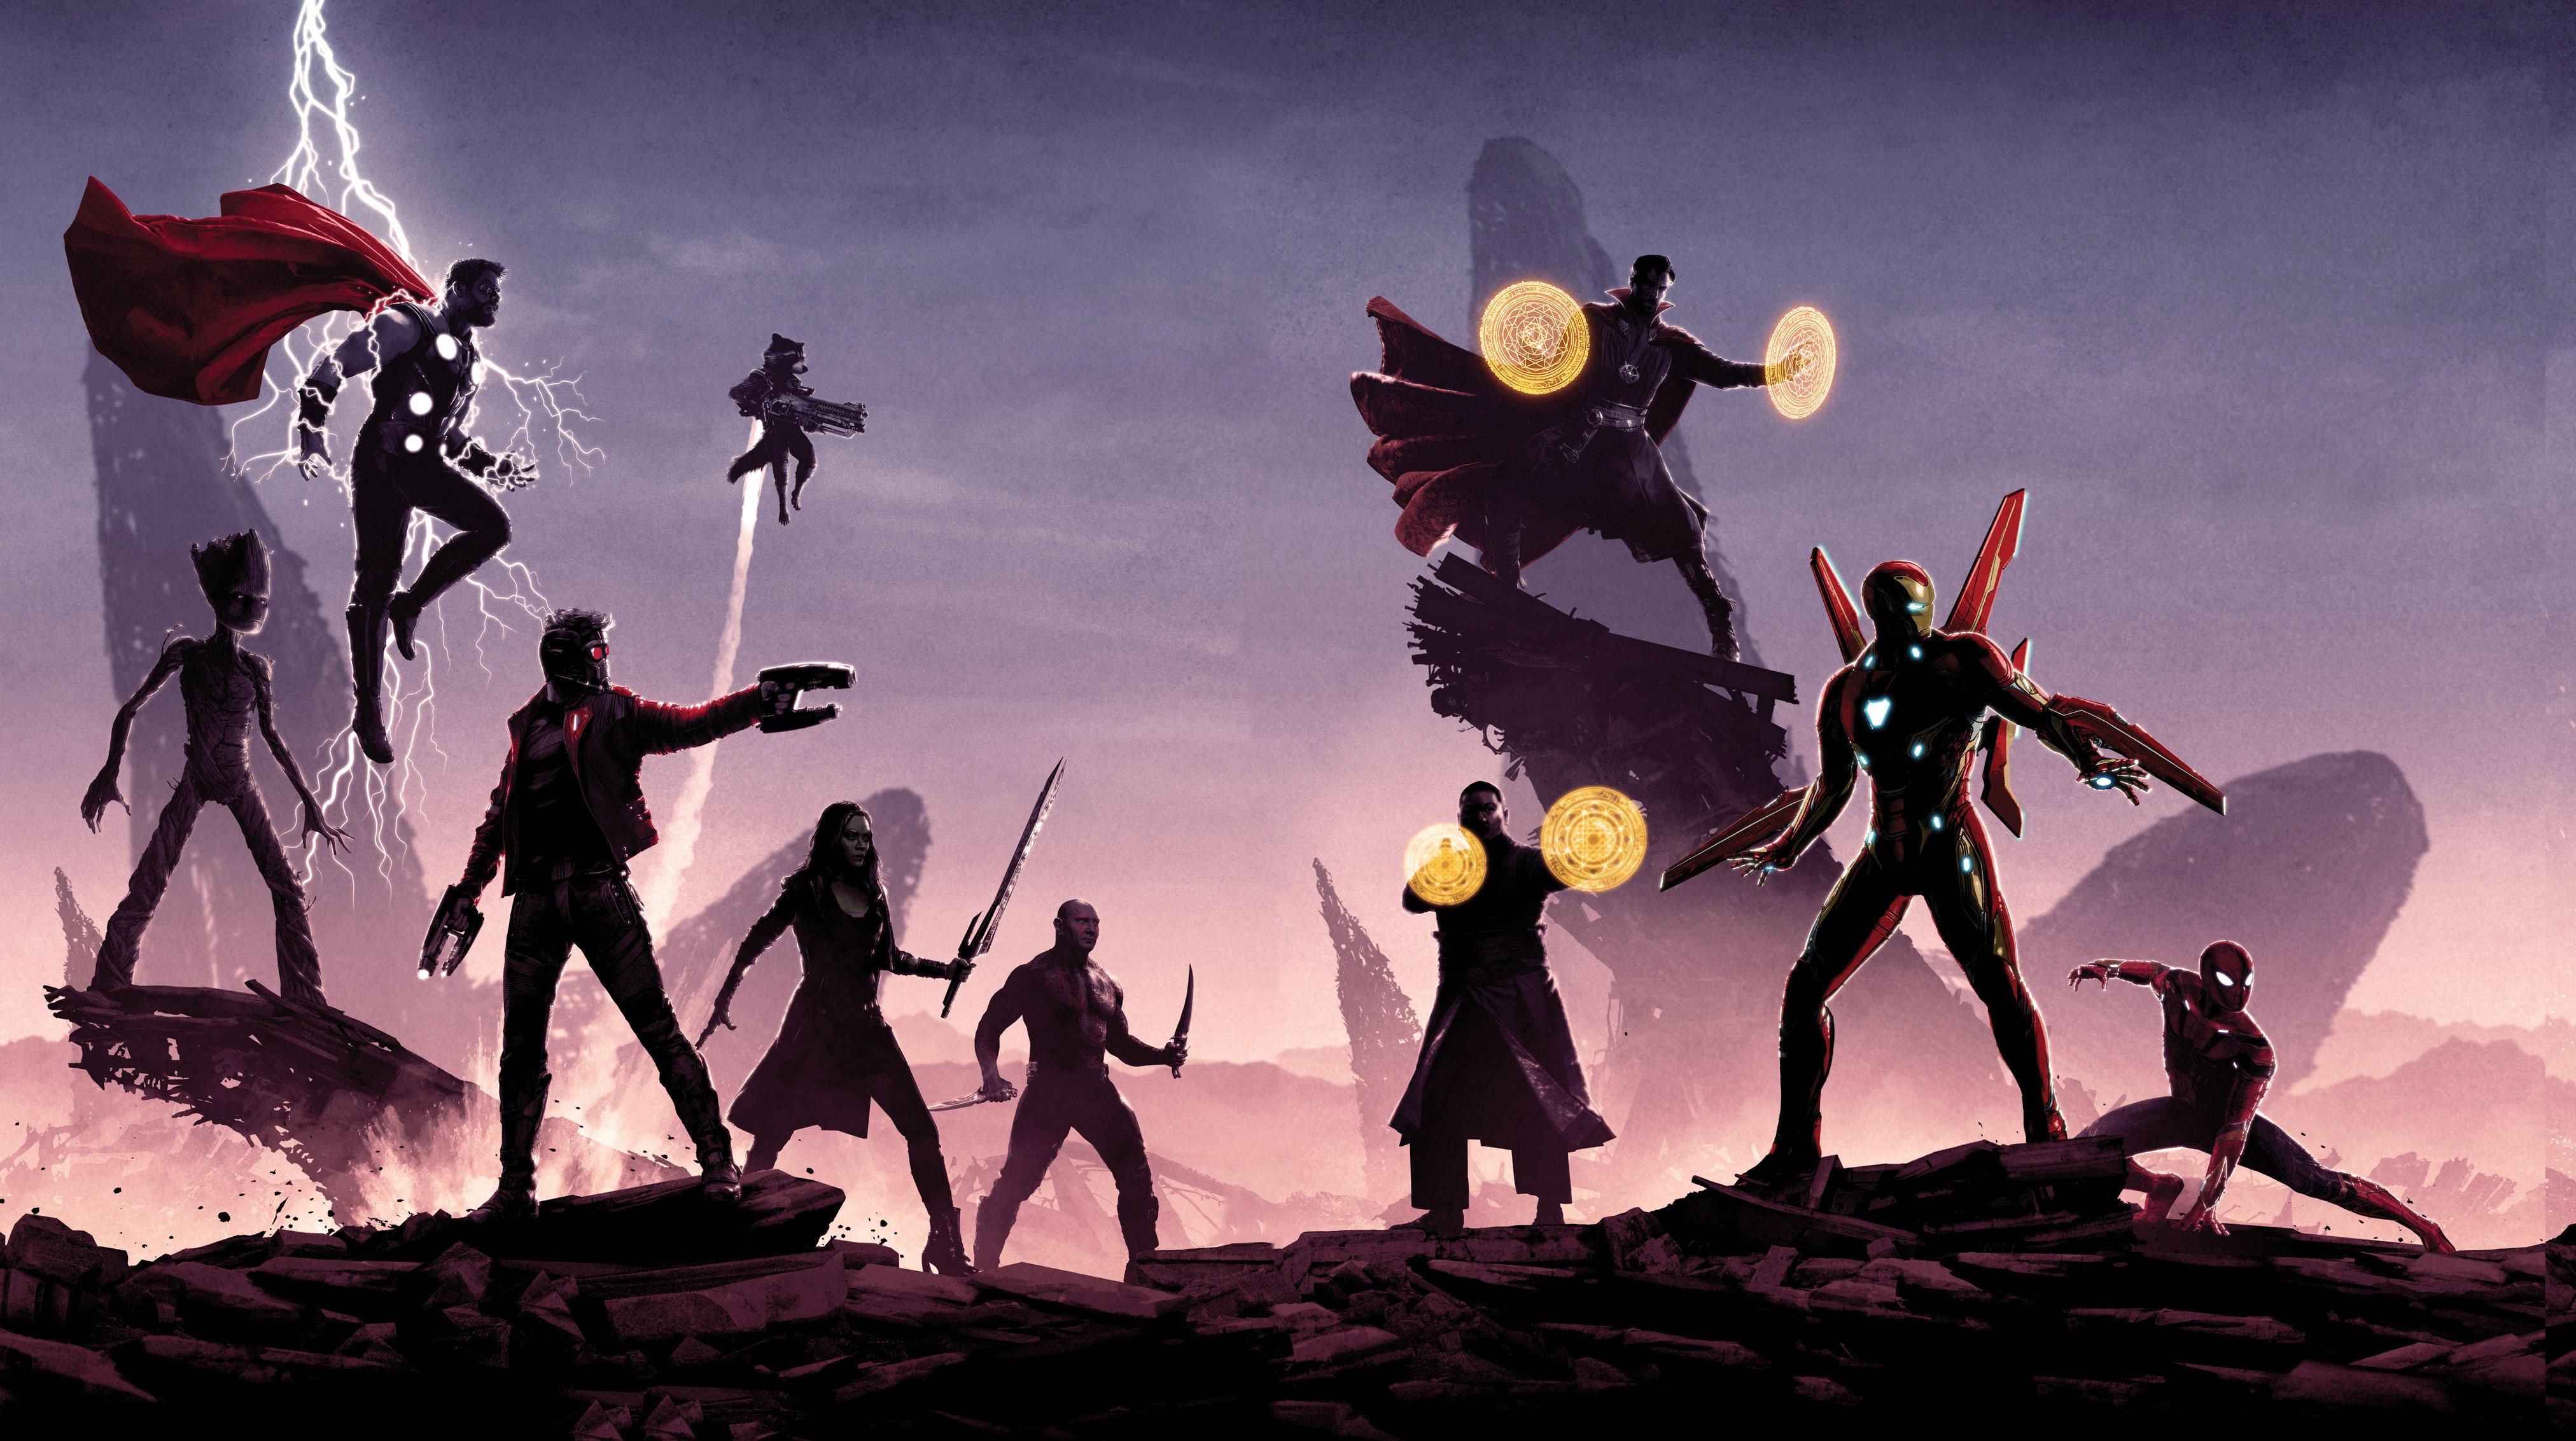 1920x1080 Avengers Infinity War Promotion Poster Laptop Full Hd